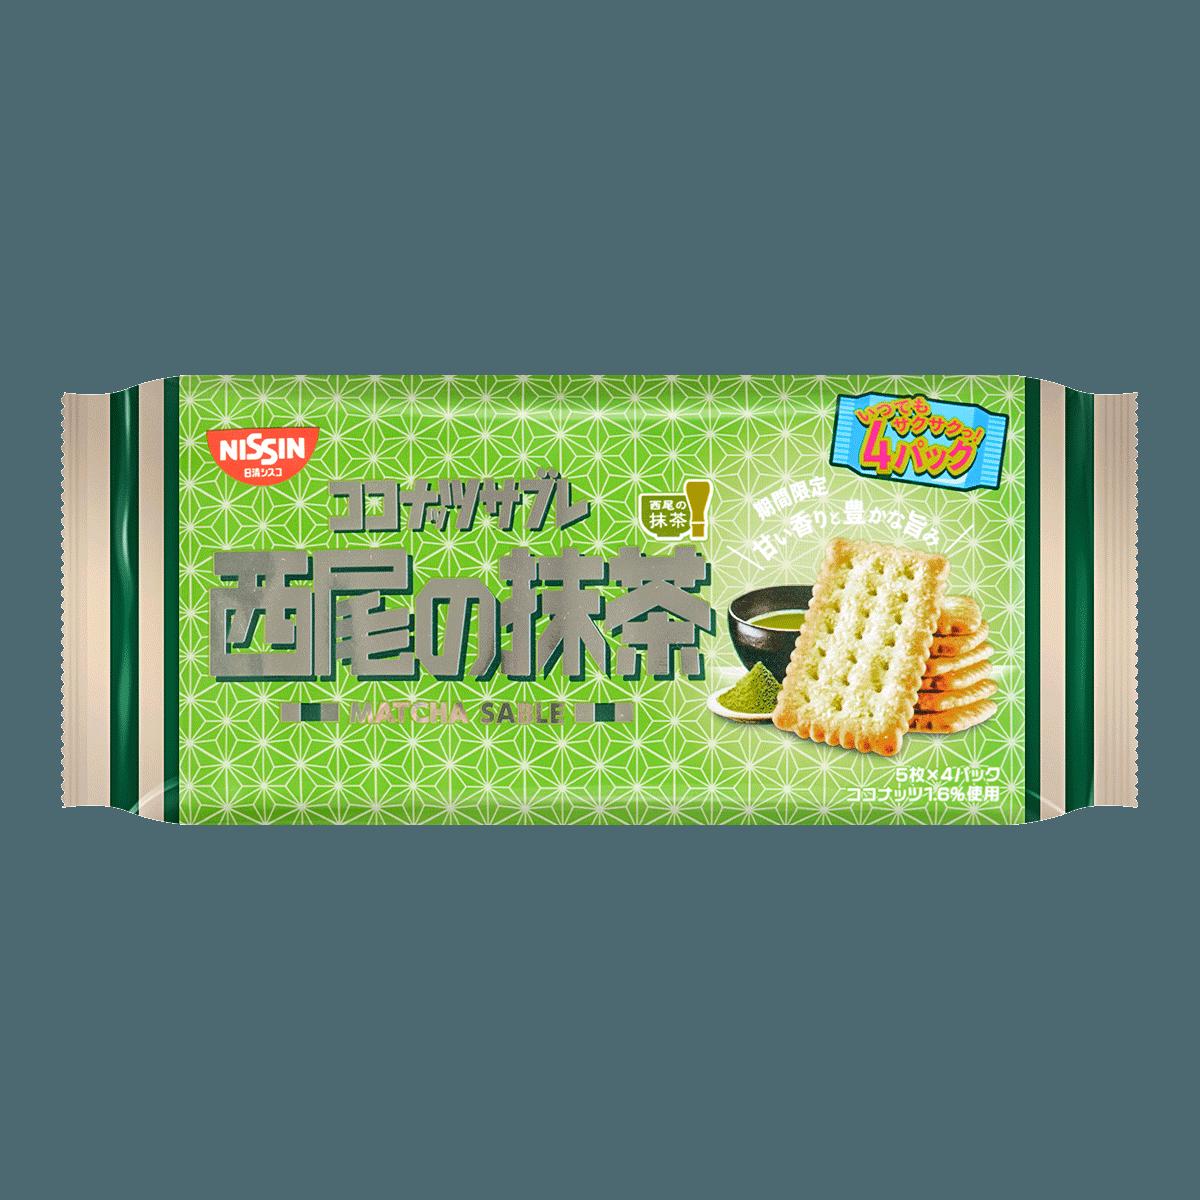 Nissin Coconut Matcha Cookies 128g